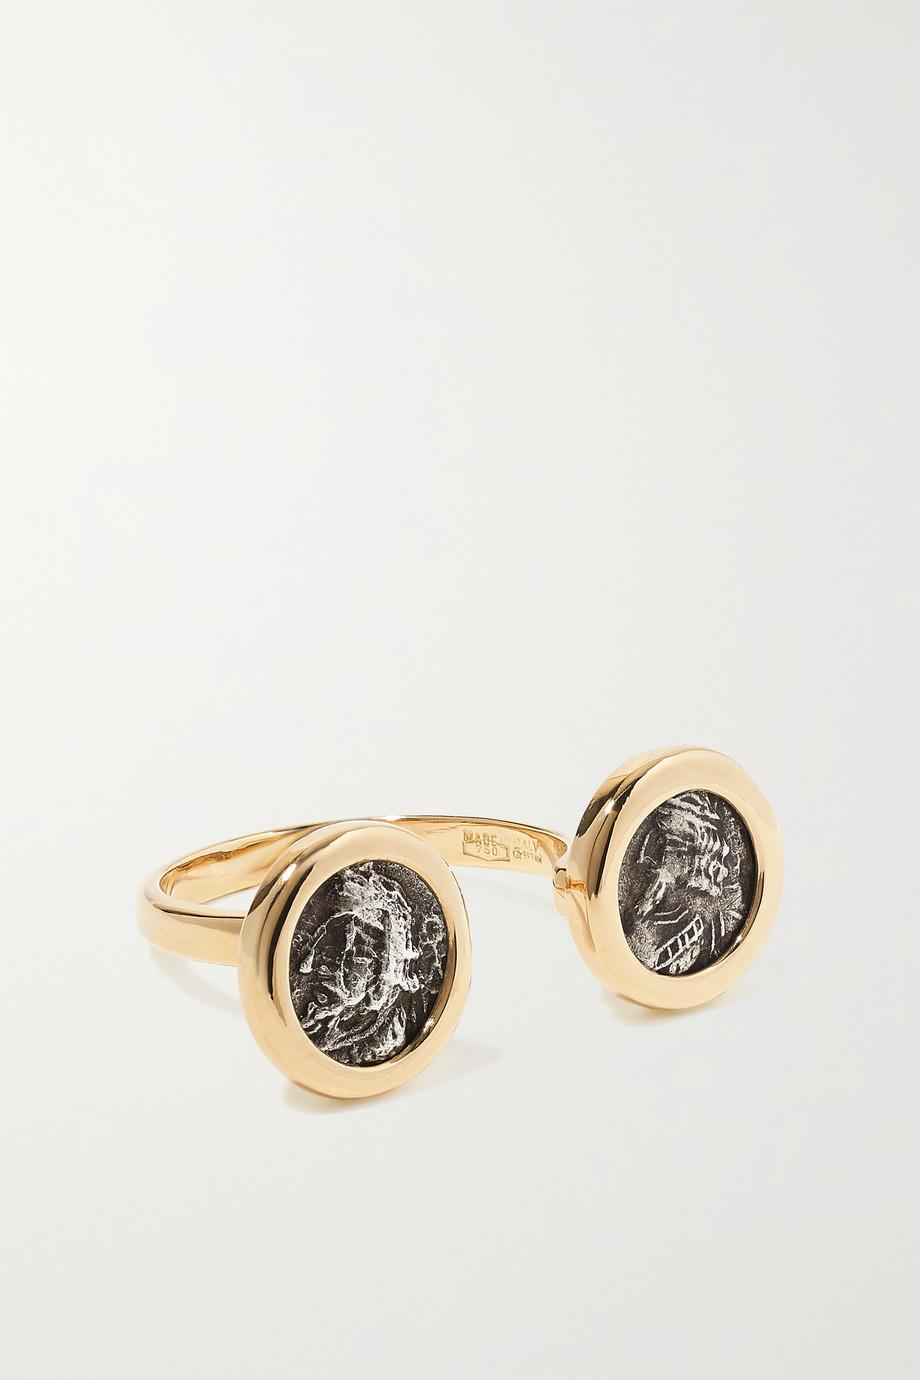 Dubini 18-karat gold and silver ring